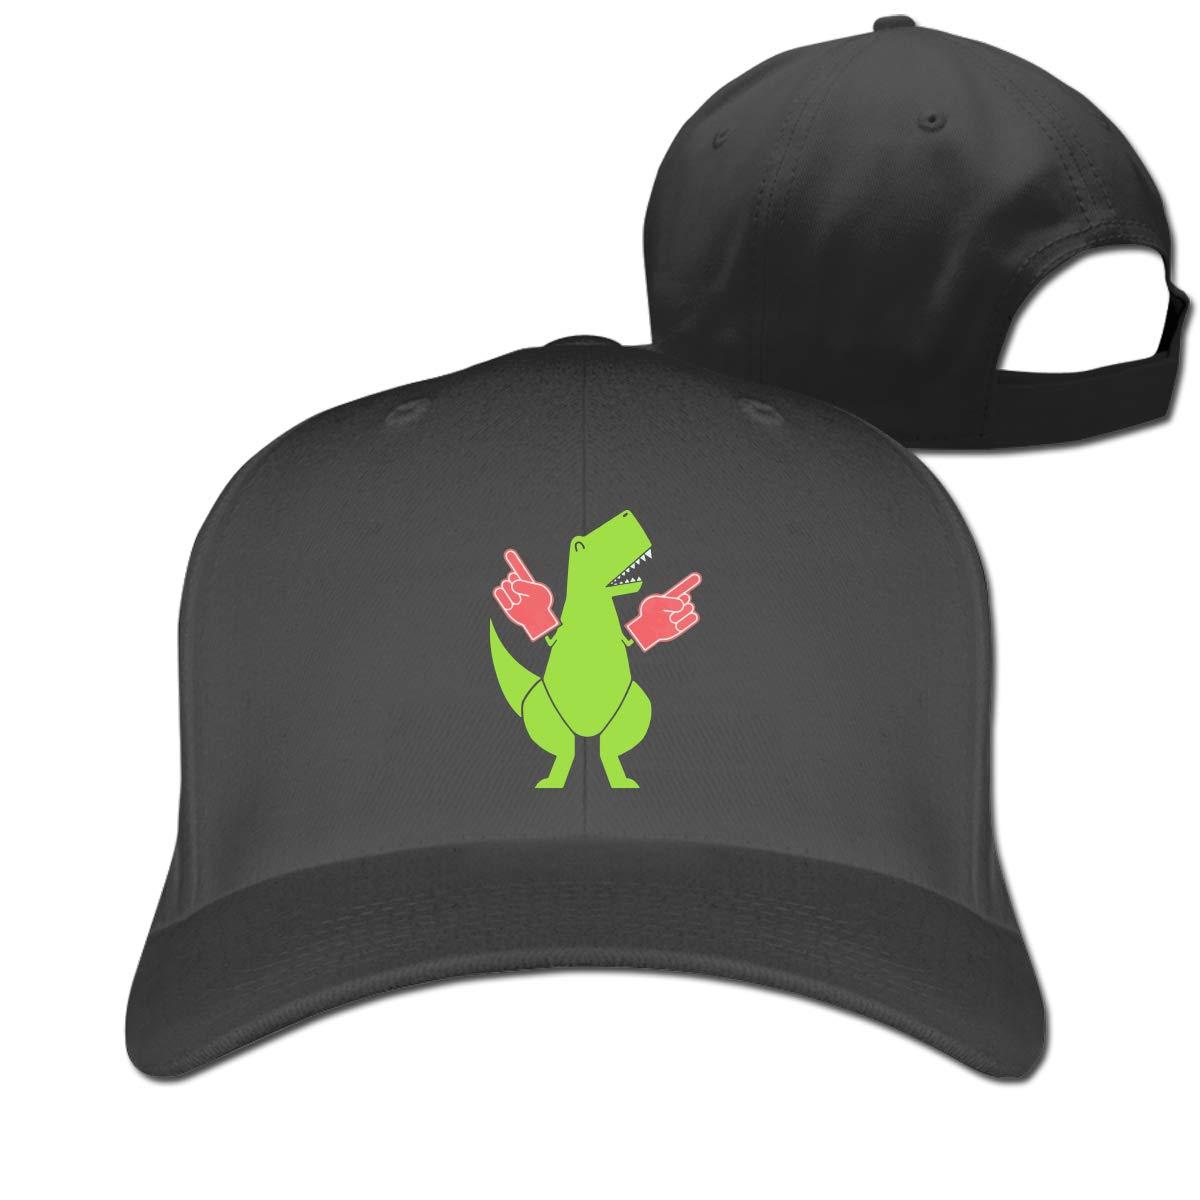 Yay Big Hands Unisex Pure Color Baseball Cap Classic Adjustable Ball Hat